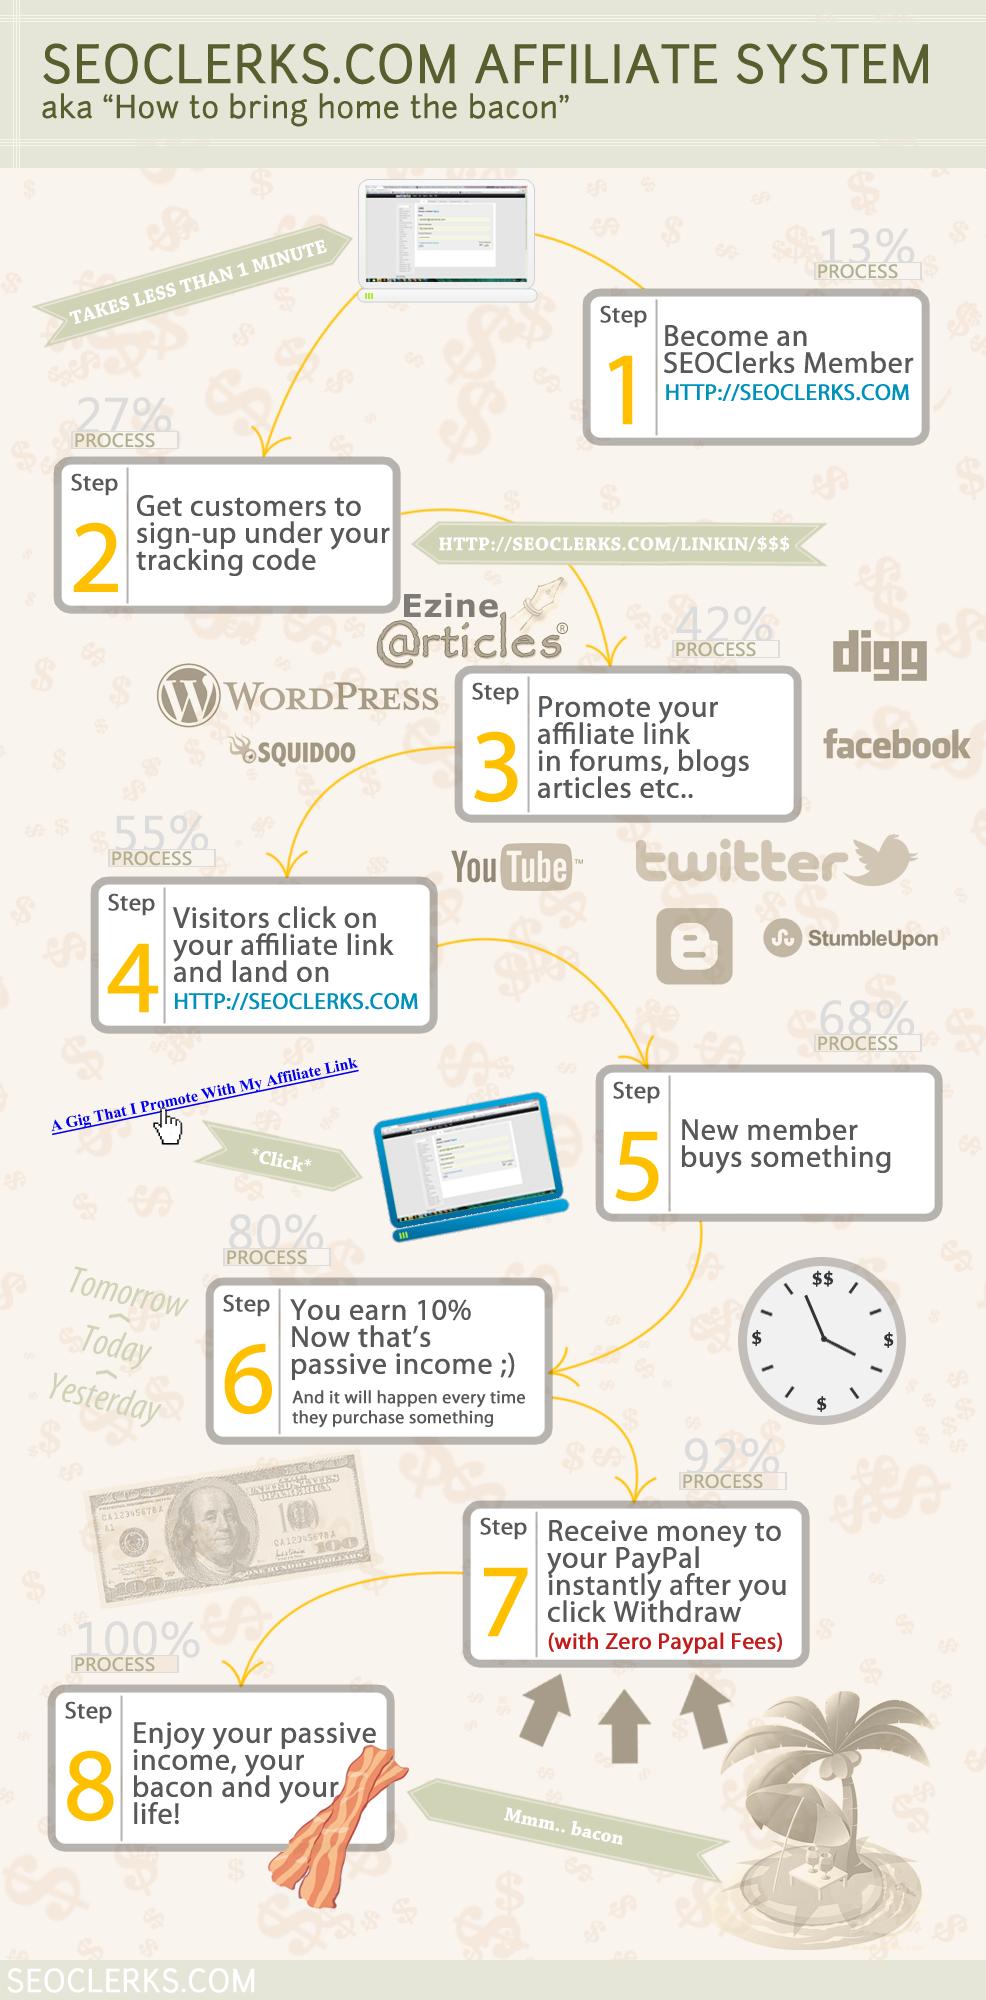 awww.seoclerks.com_blog_wp_content_uploads_2012_02_Infograph_v2.png